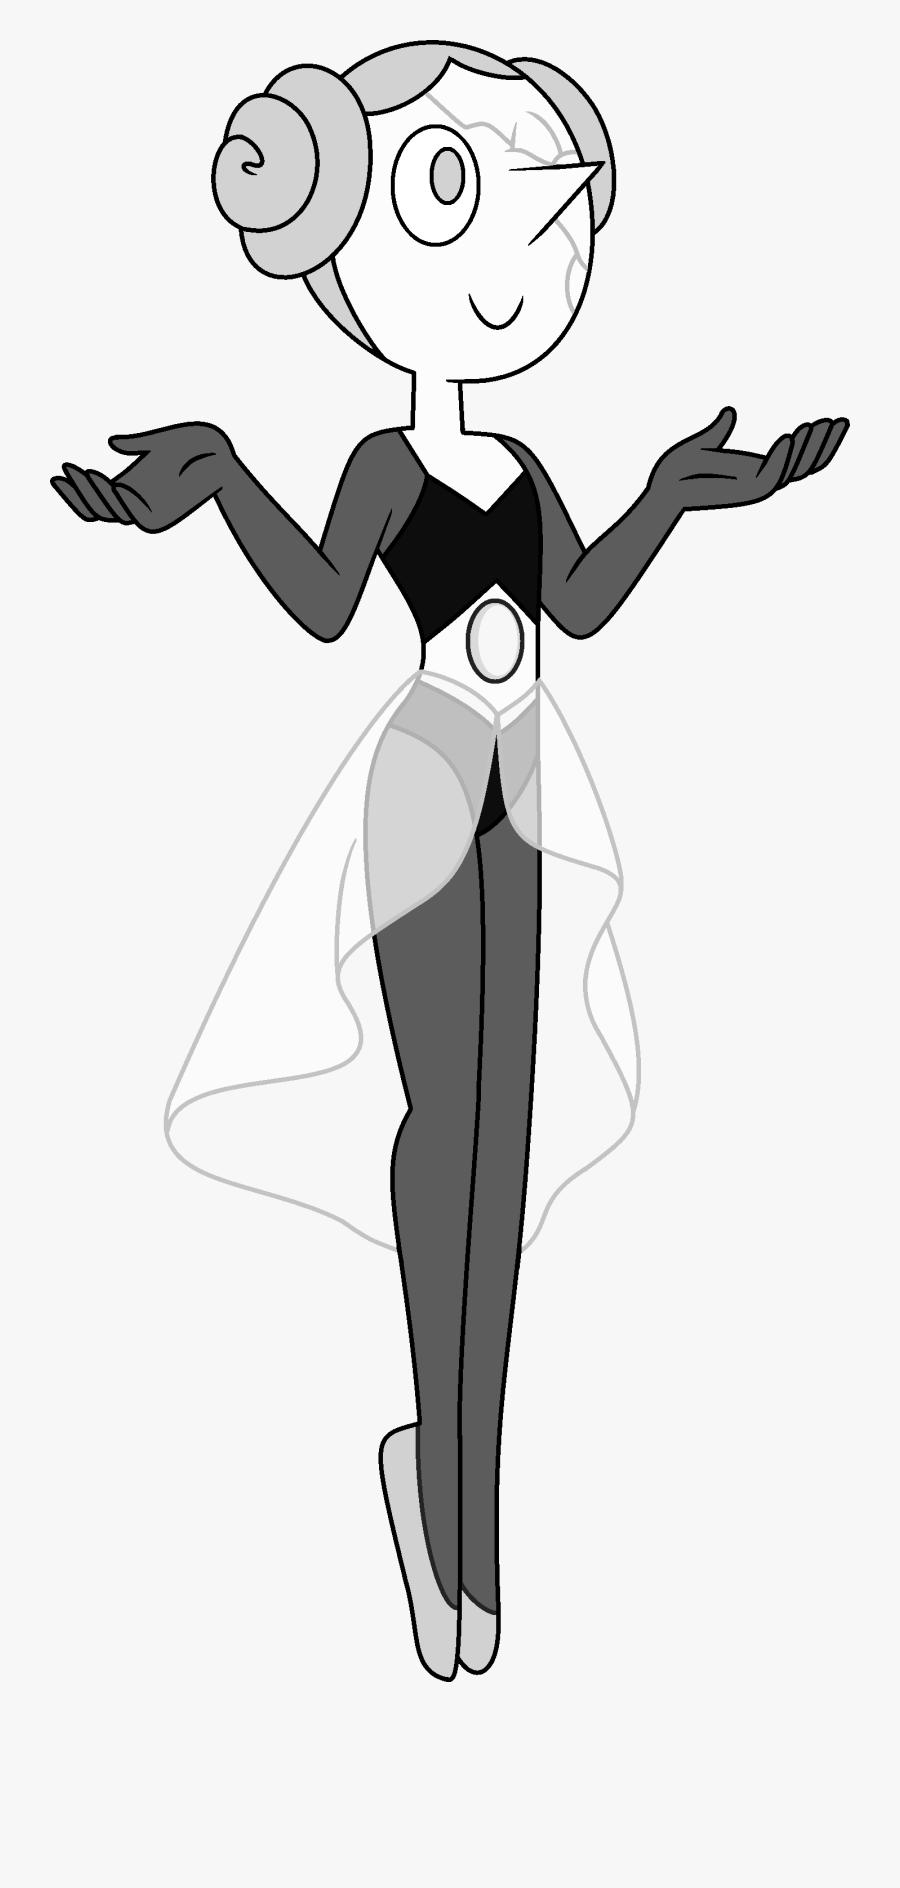 Pearl Clipart Steven Universe - Steven Universe White Pearl, Transparent Clipart